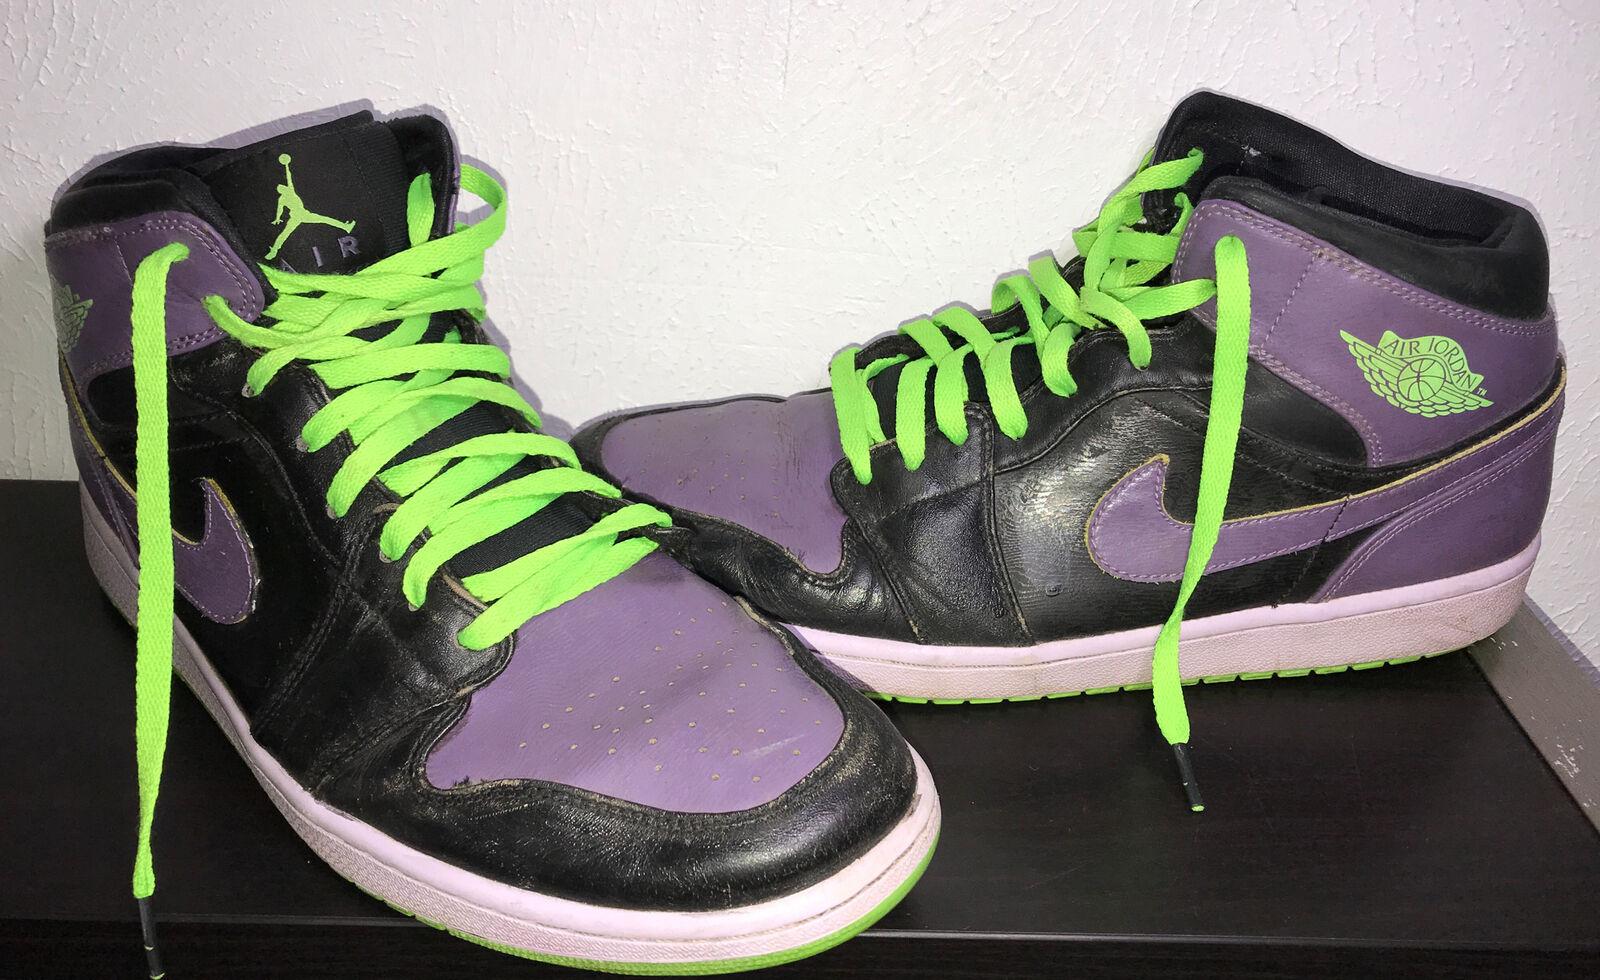 Men's Nike Air Jordan 1 Retro Mid Joker Black Purple Green Size 13 136065-021